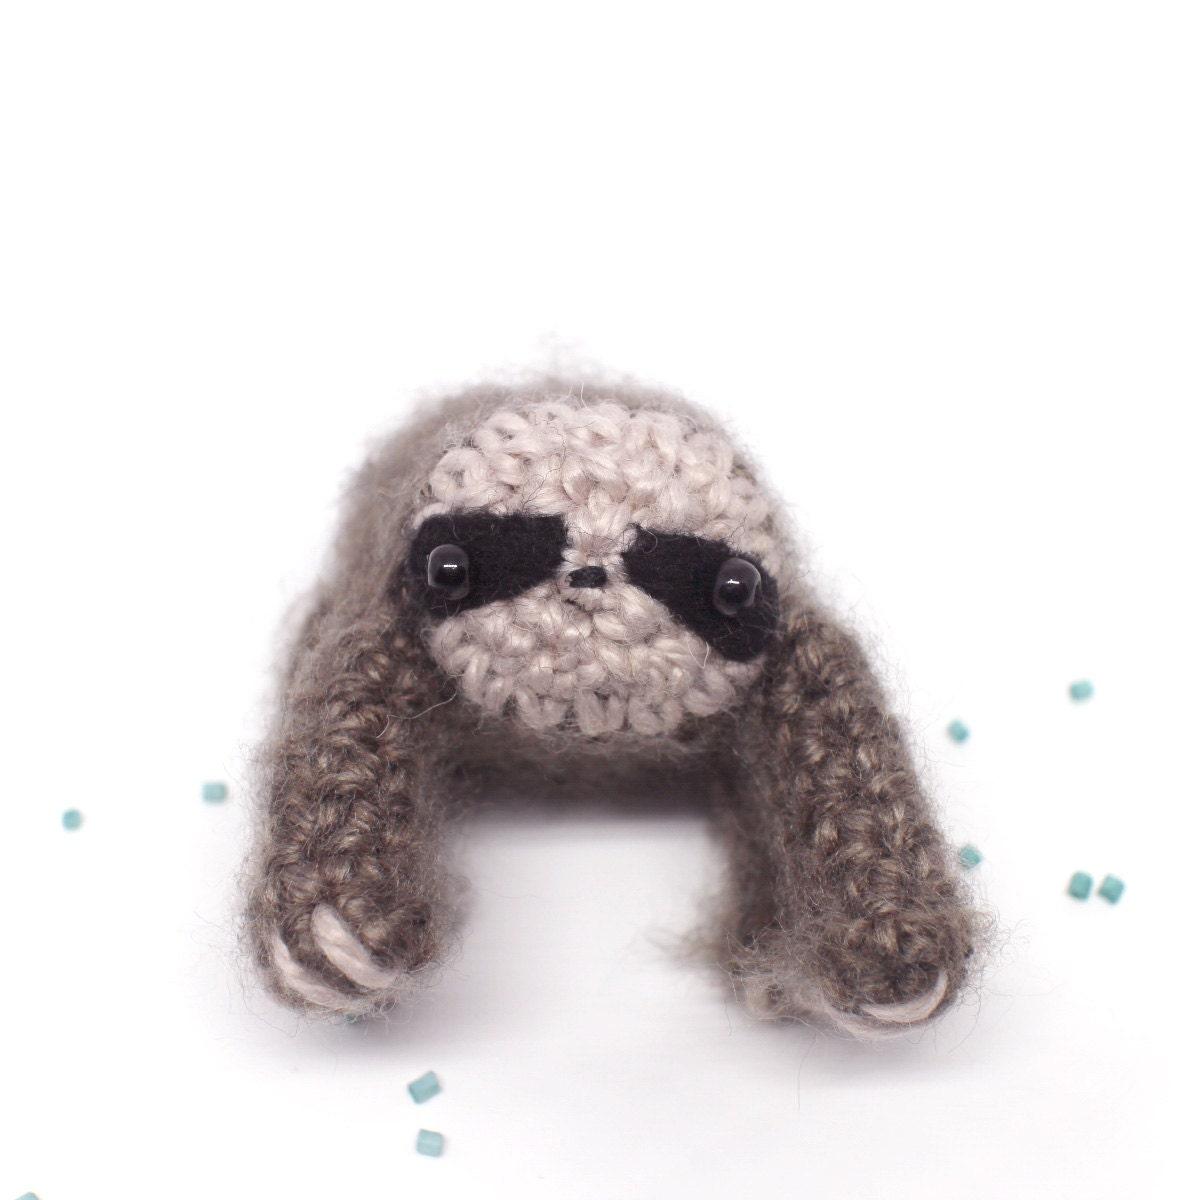 Amigurumi Stuffed Animals : sloth stuffed animal crochet amigurumi plush by mohustore ...